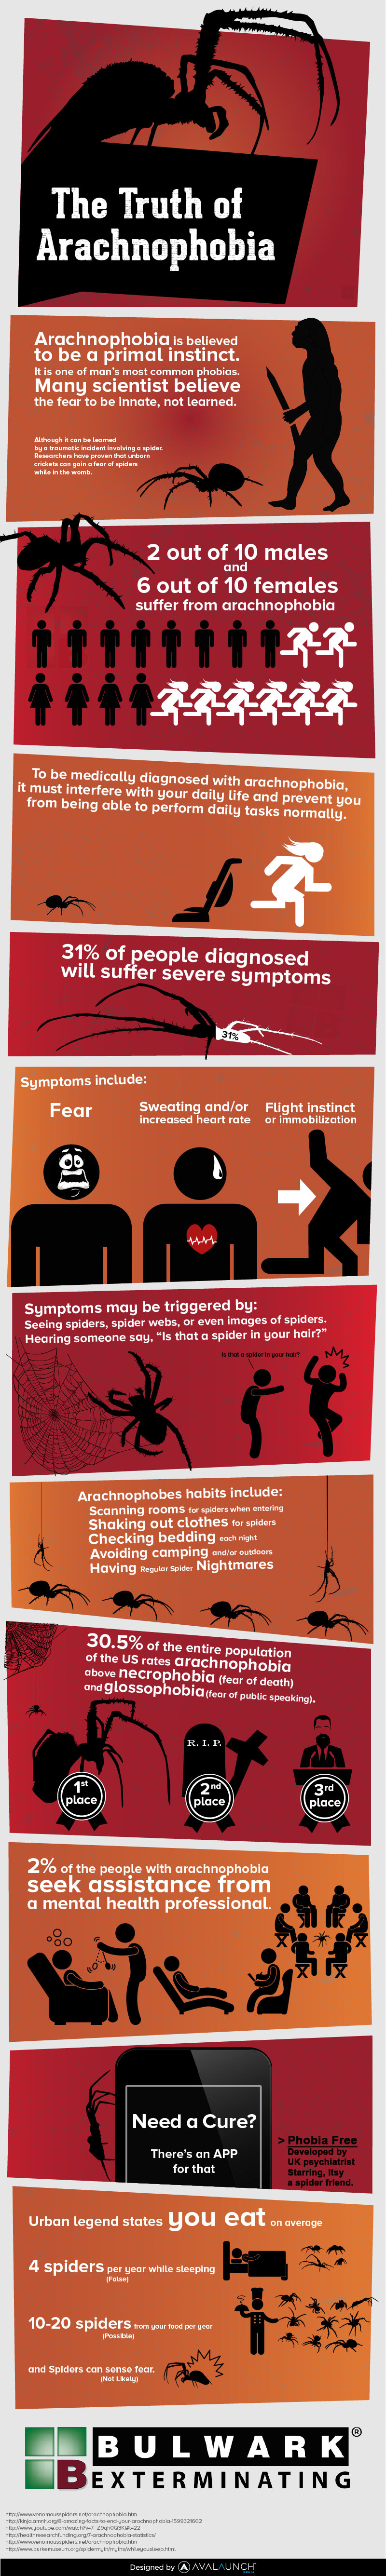 The Truth of Arachnophobia